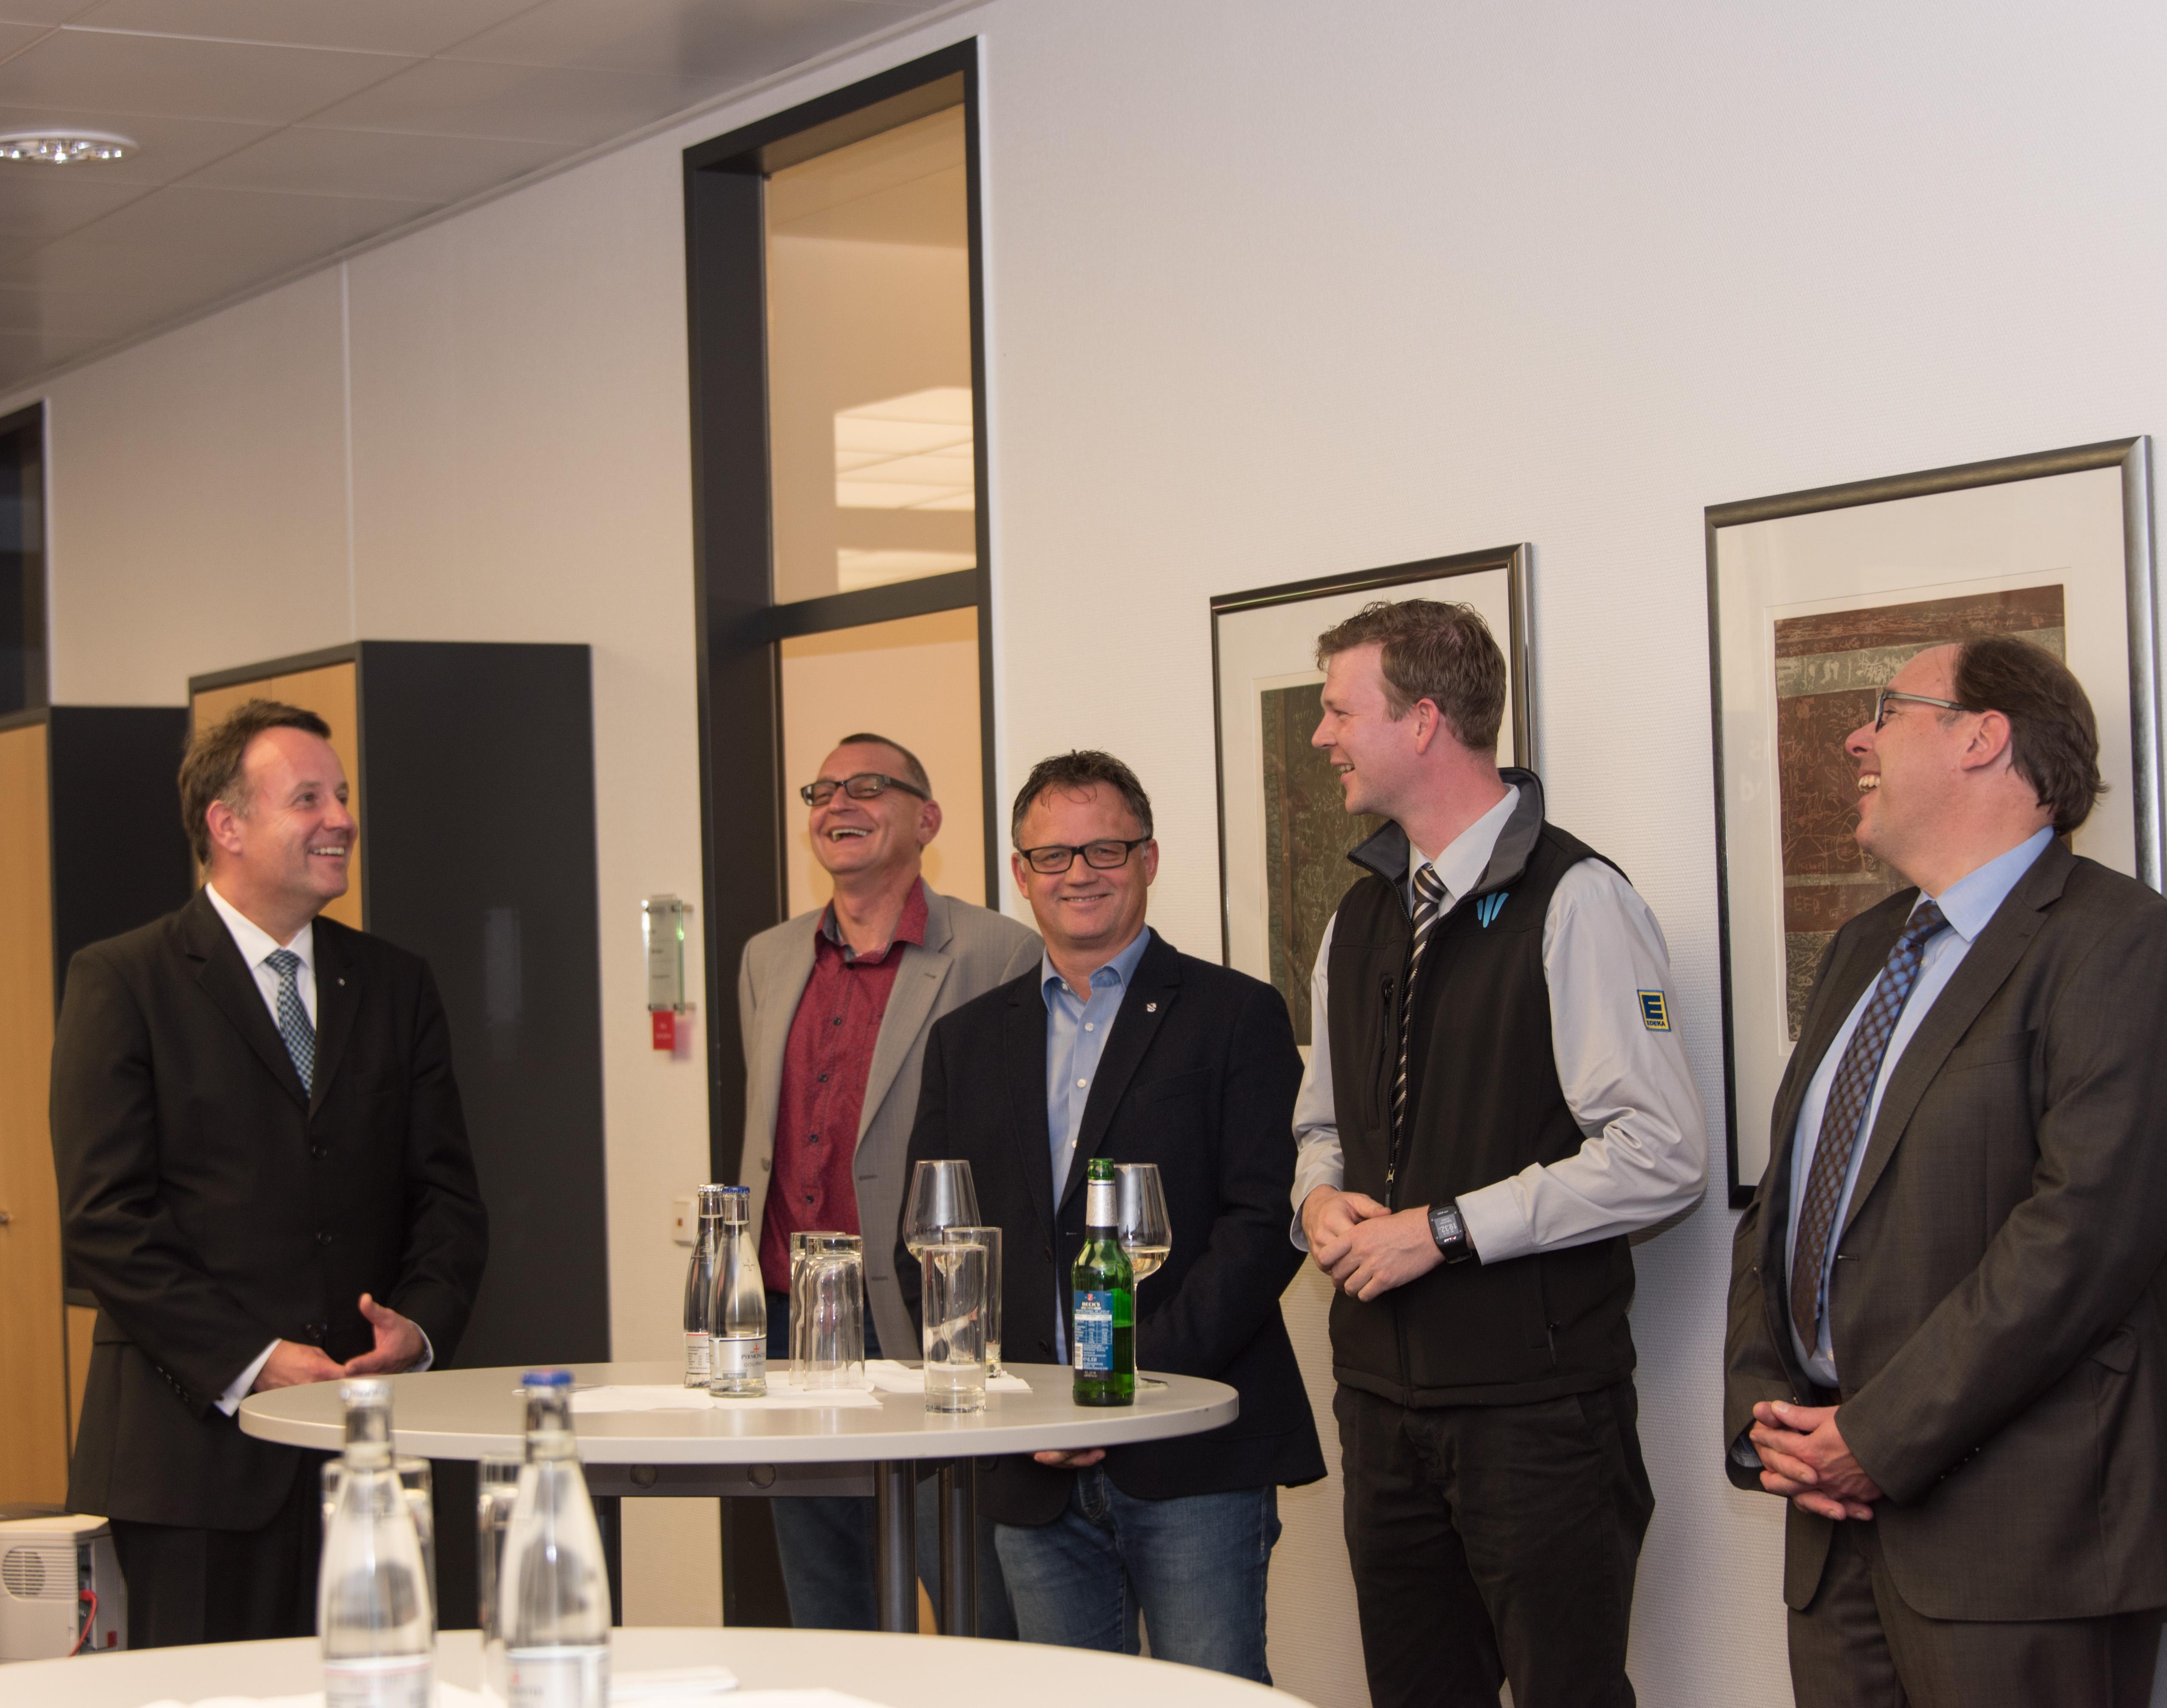 vl. Dirk Breuckmann, Thorsten Heinrich, Frank Leibelt, Sebastian Cramer, Gregor Schneider